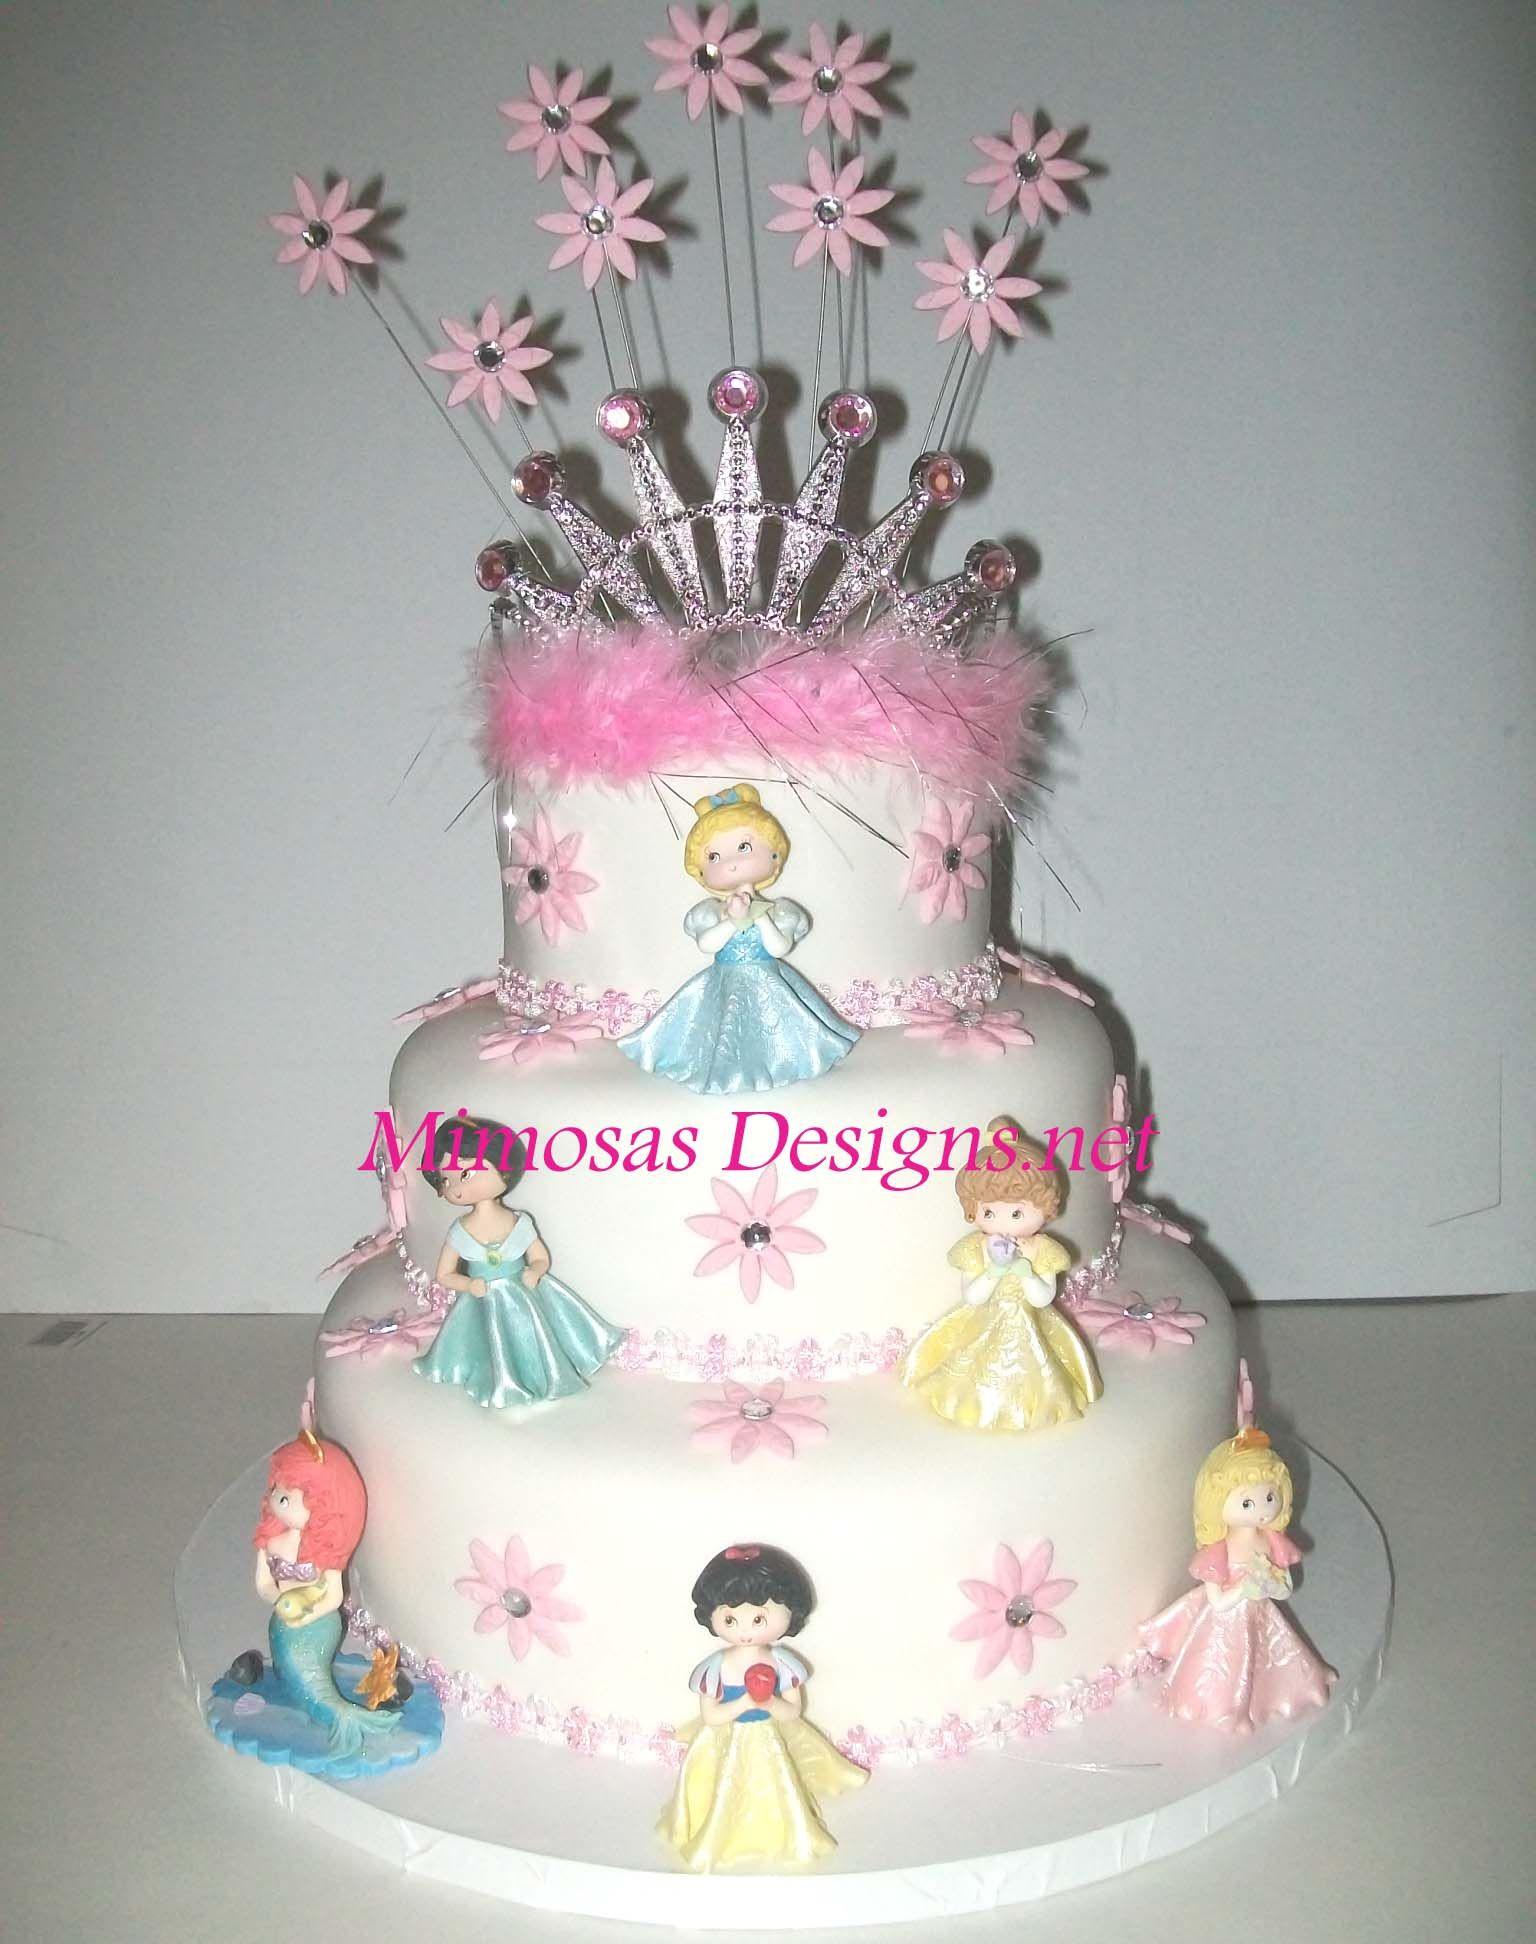 princess cake topper cake decoration pinterest princess cake toppers cake and beans. Black Bedroom Furniture Sets. Home Design Ideas